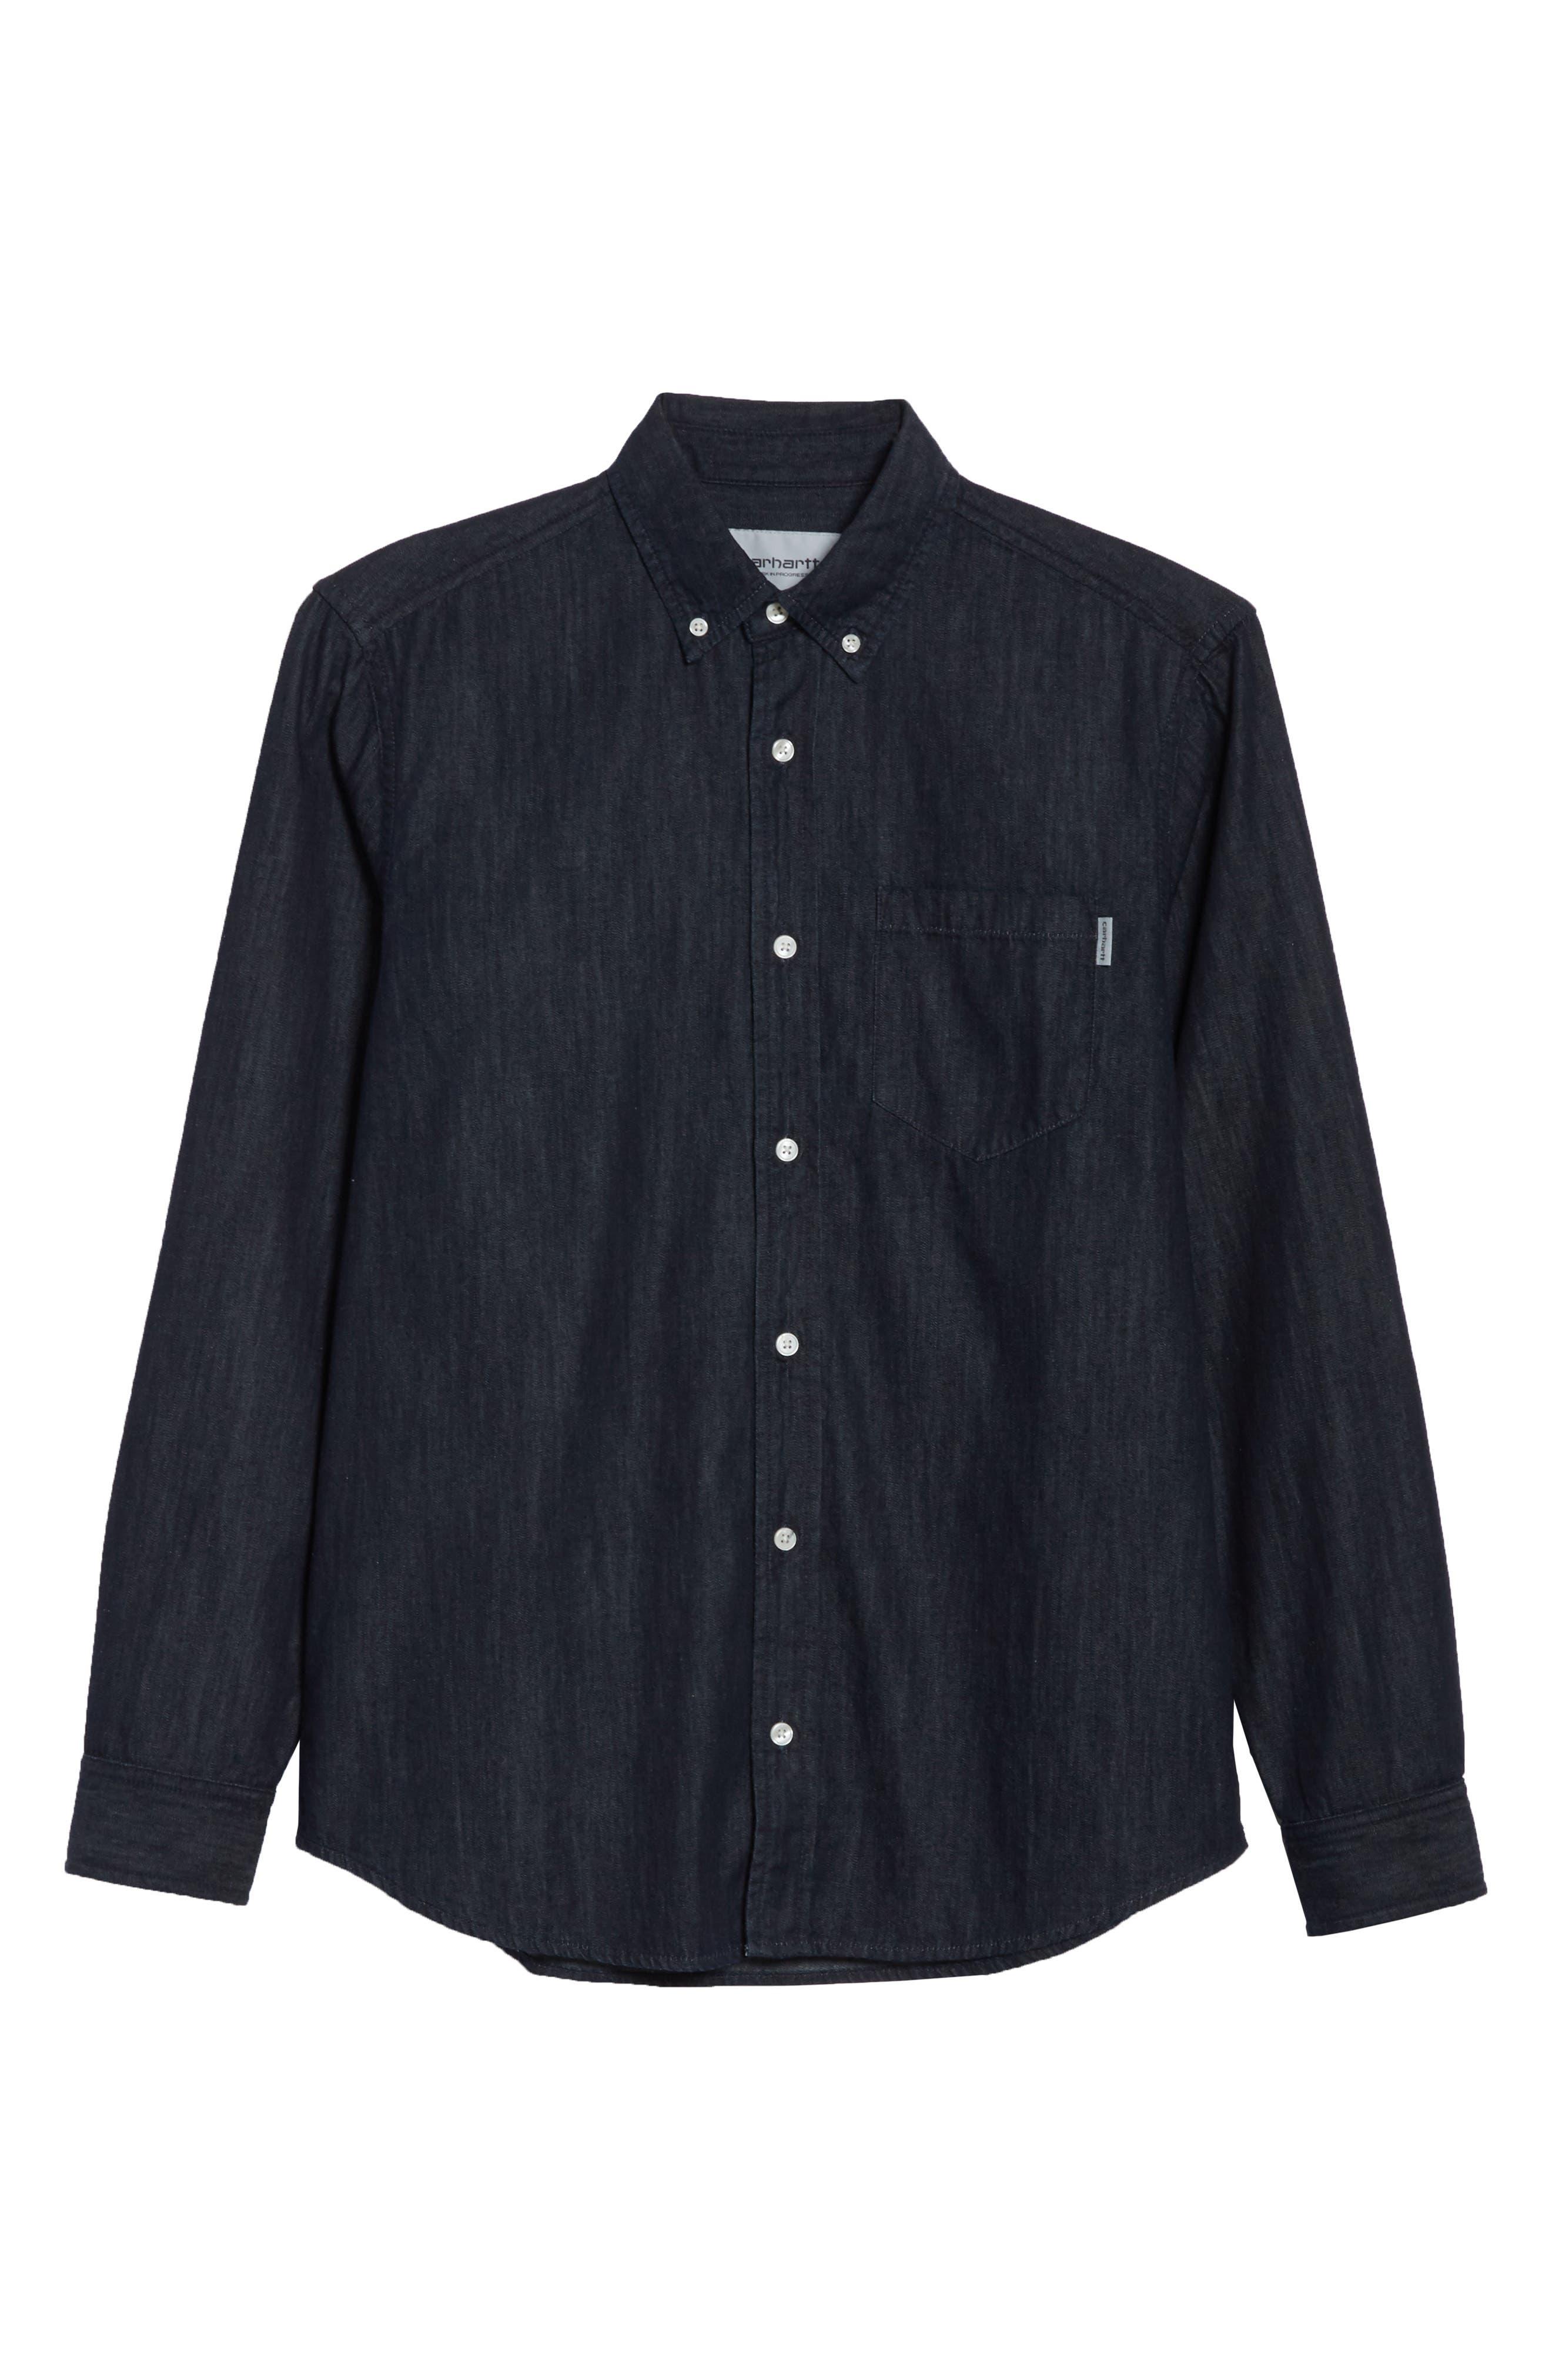 Civil Denim Shirt,                             Alternate thumbnail 6, color,                             400